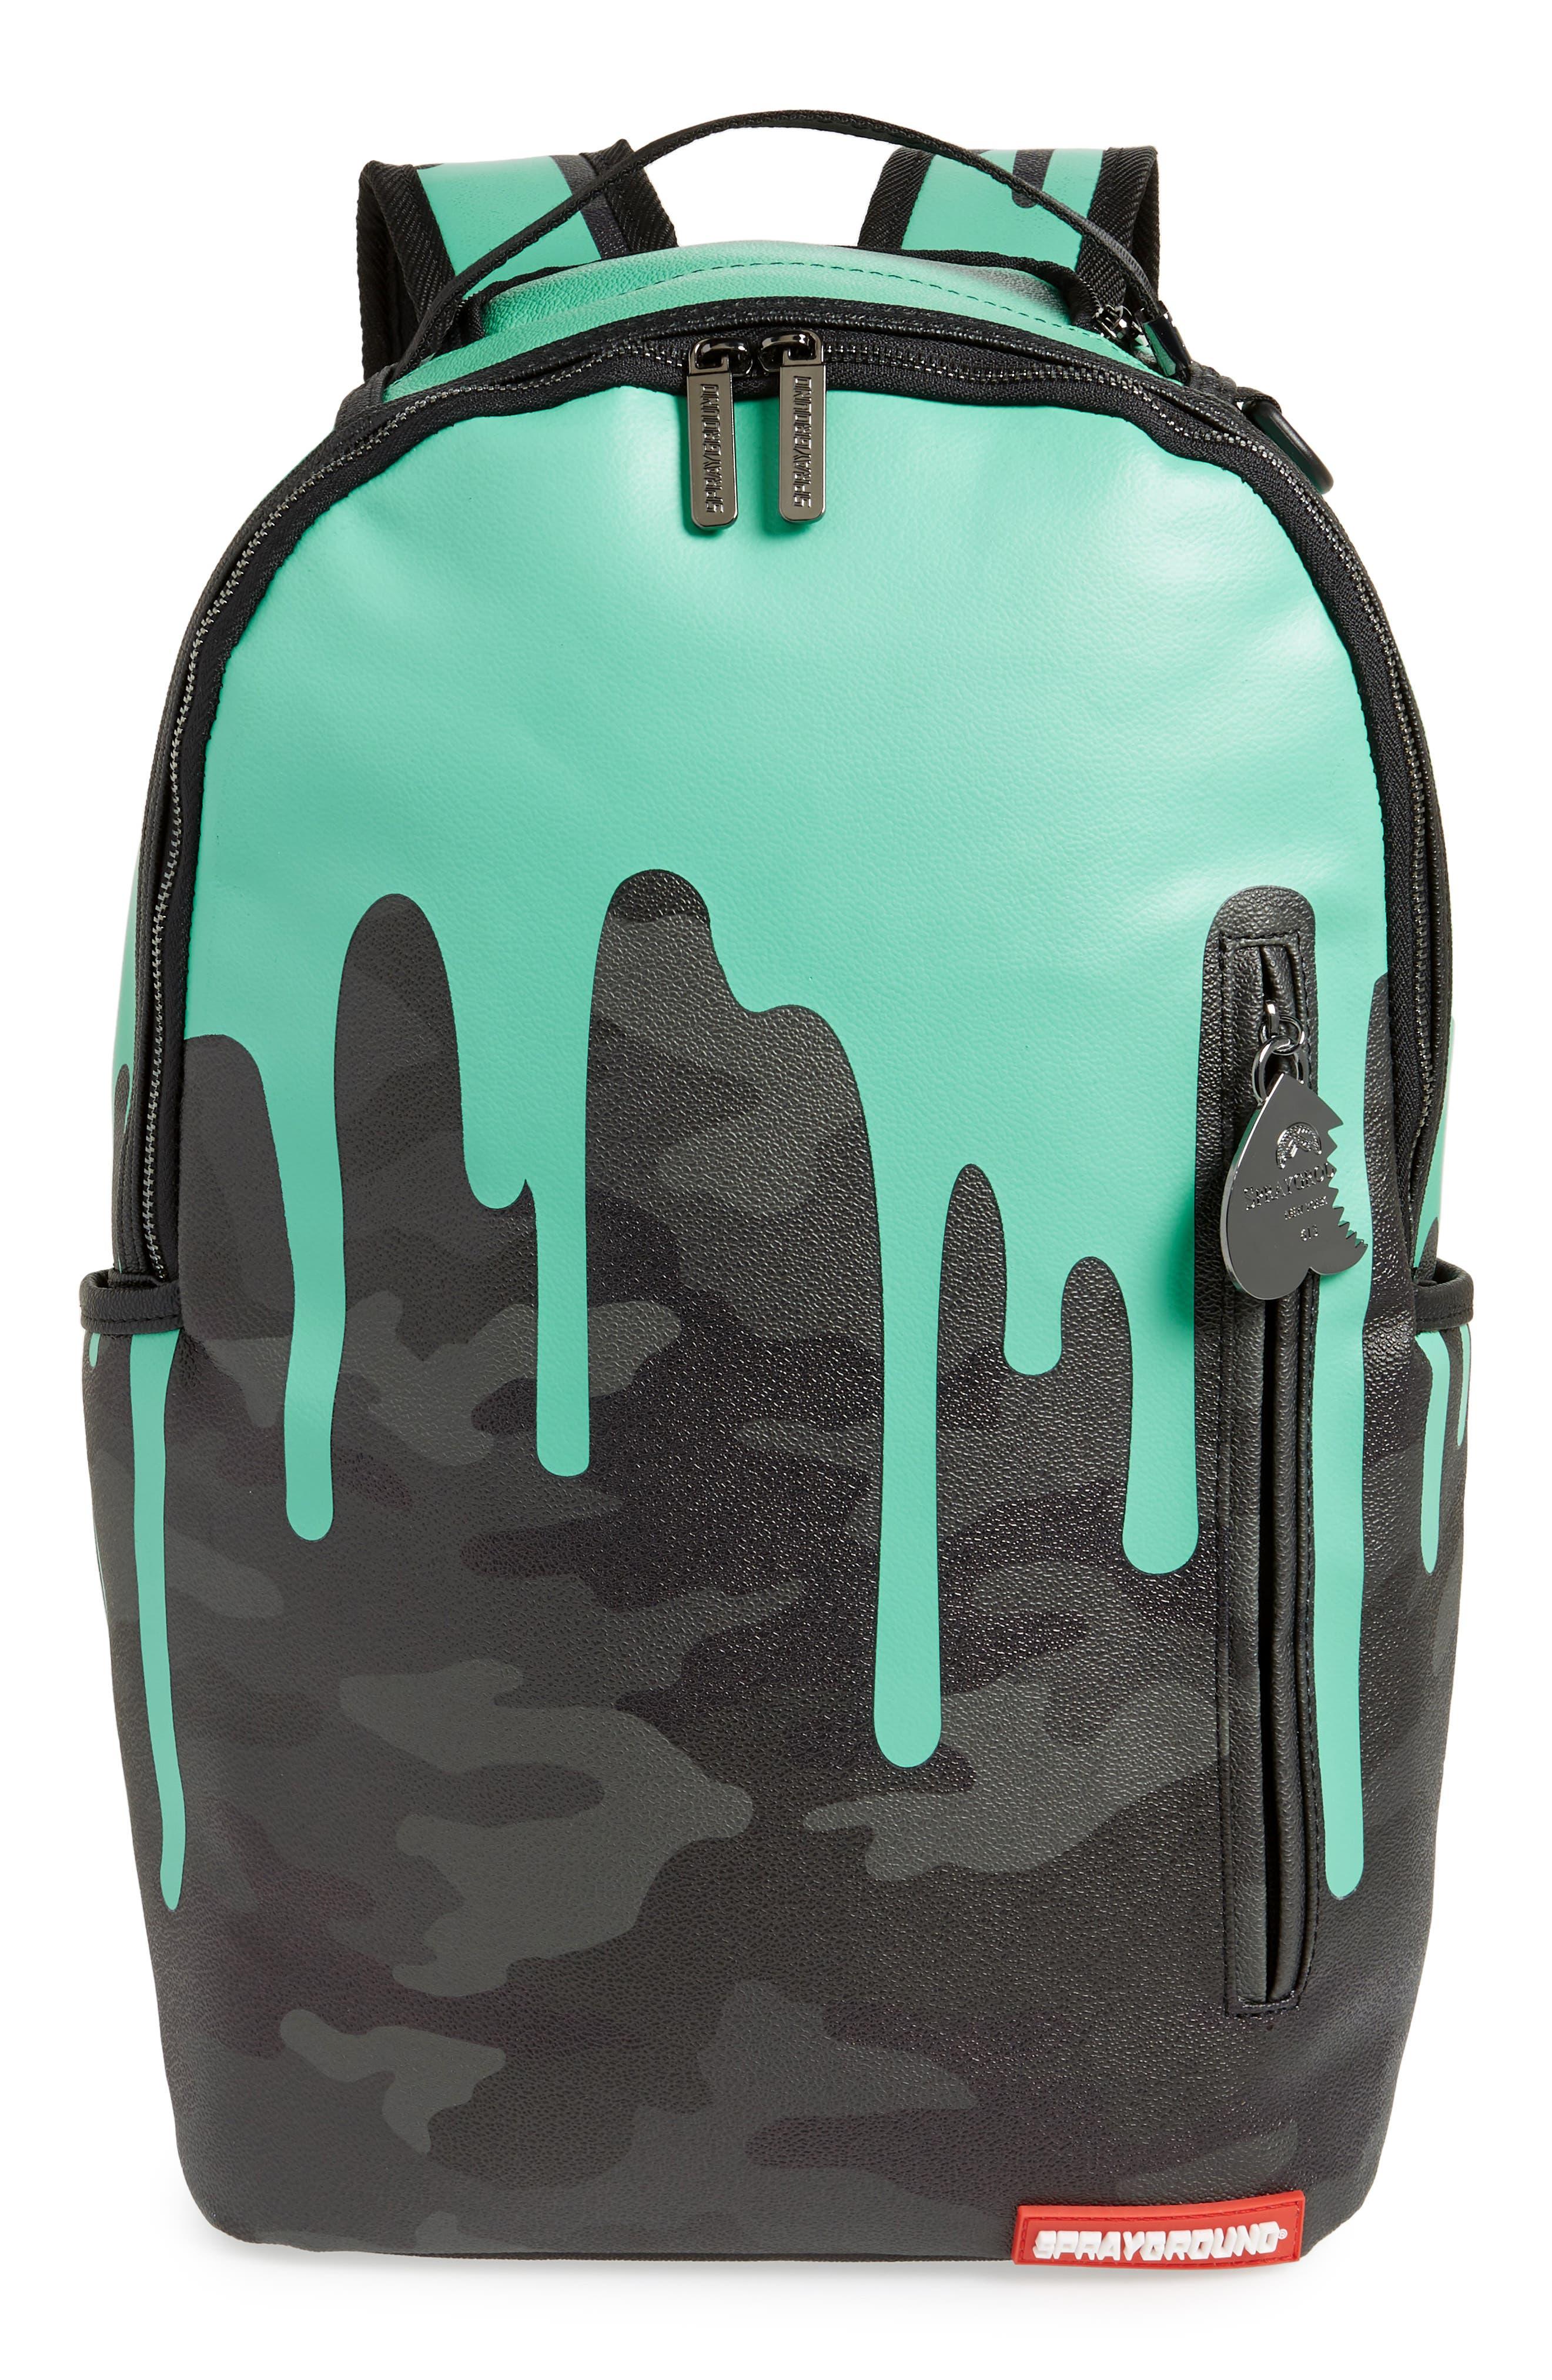 Tiff Drips Print Backpack,                             Main thumbnail 1, color,                             Camo/ Teal